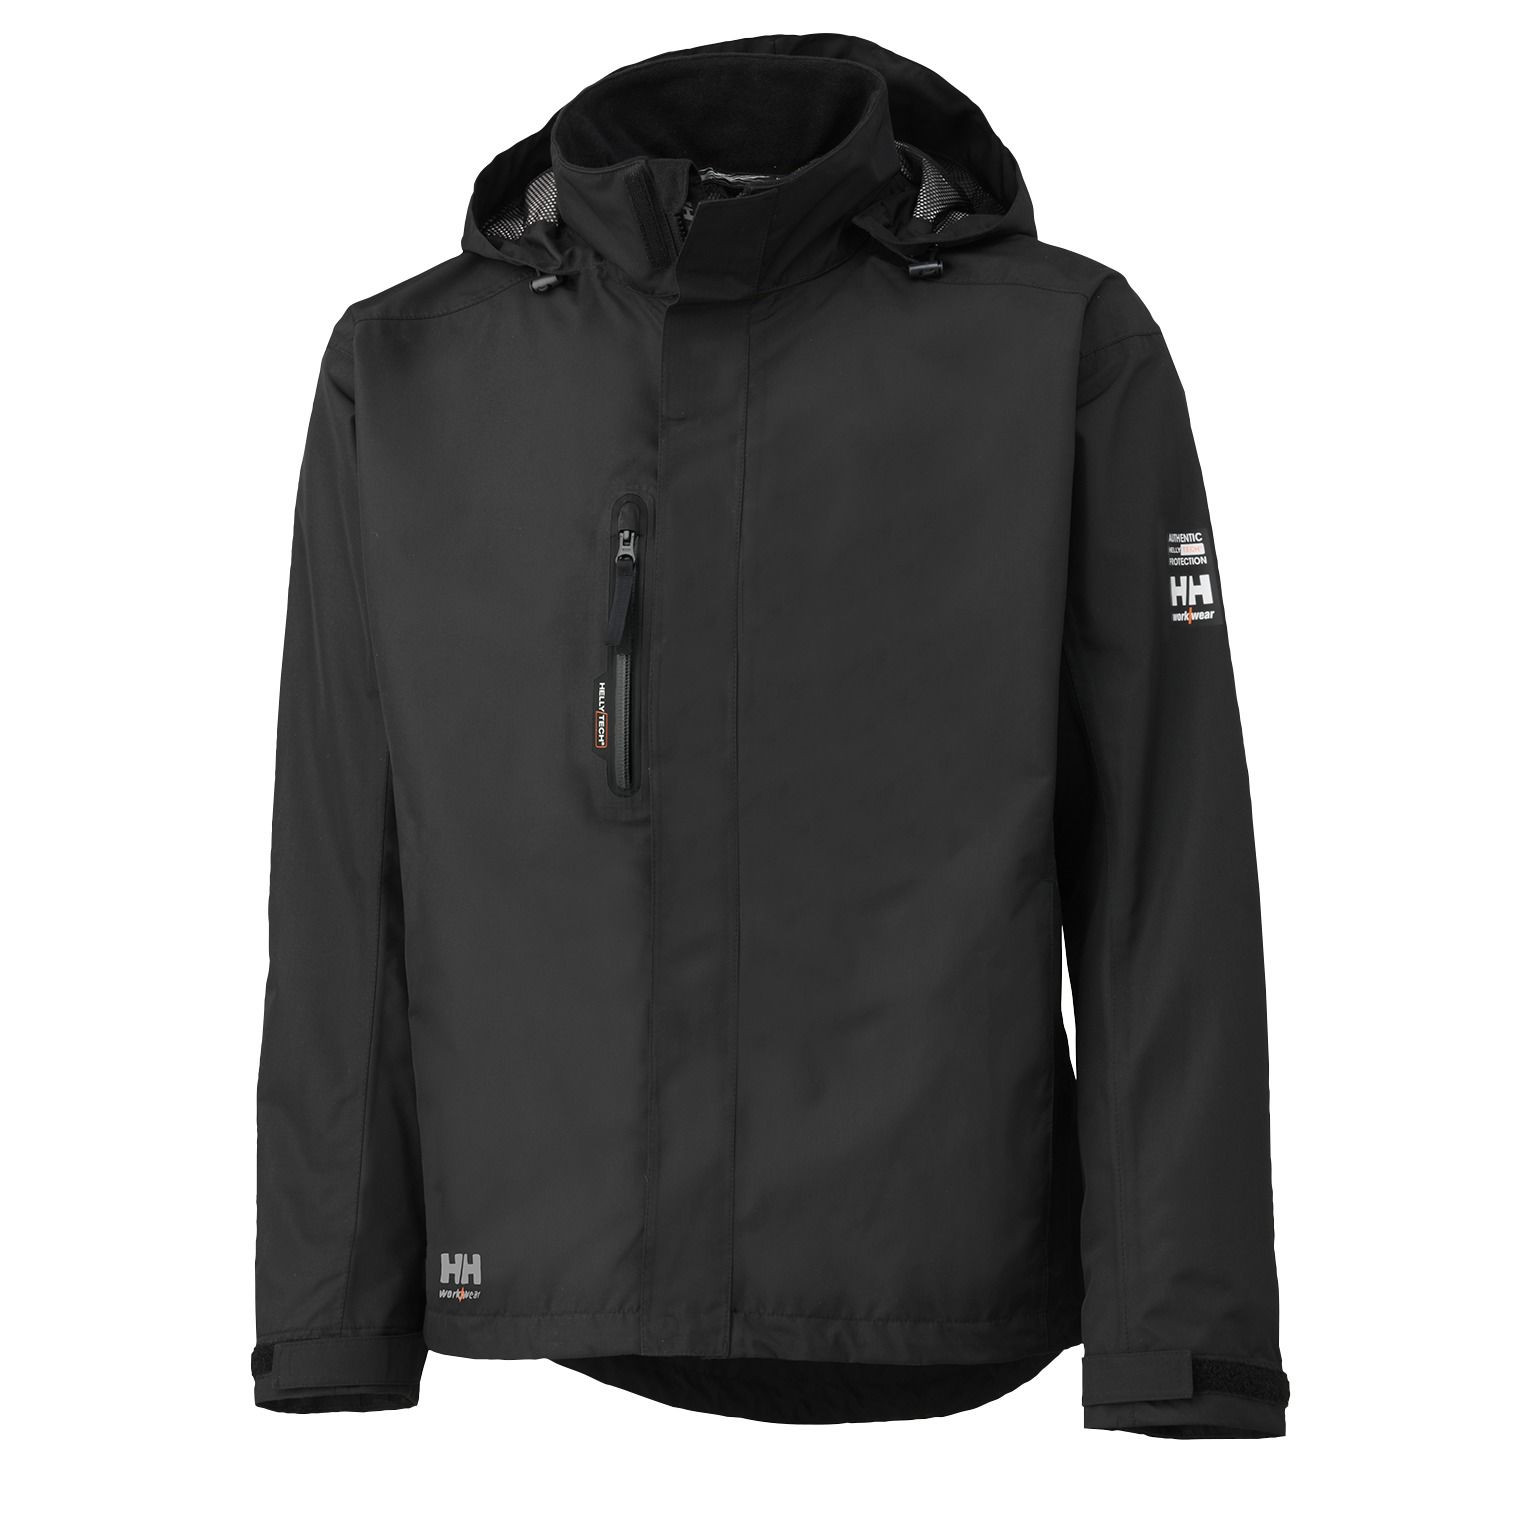 Куртка Helly Hansen Haag Jacket - 71043 (Black; M)